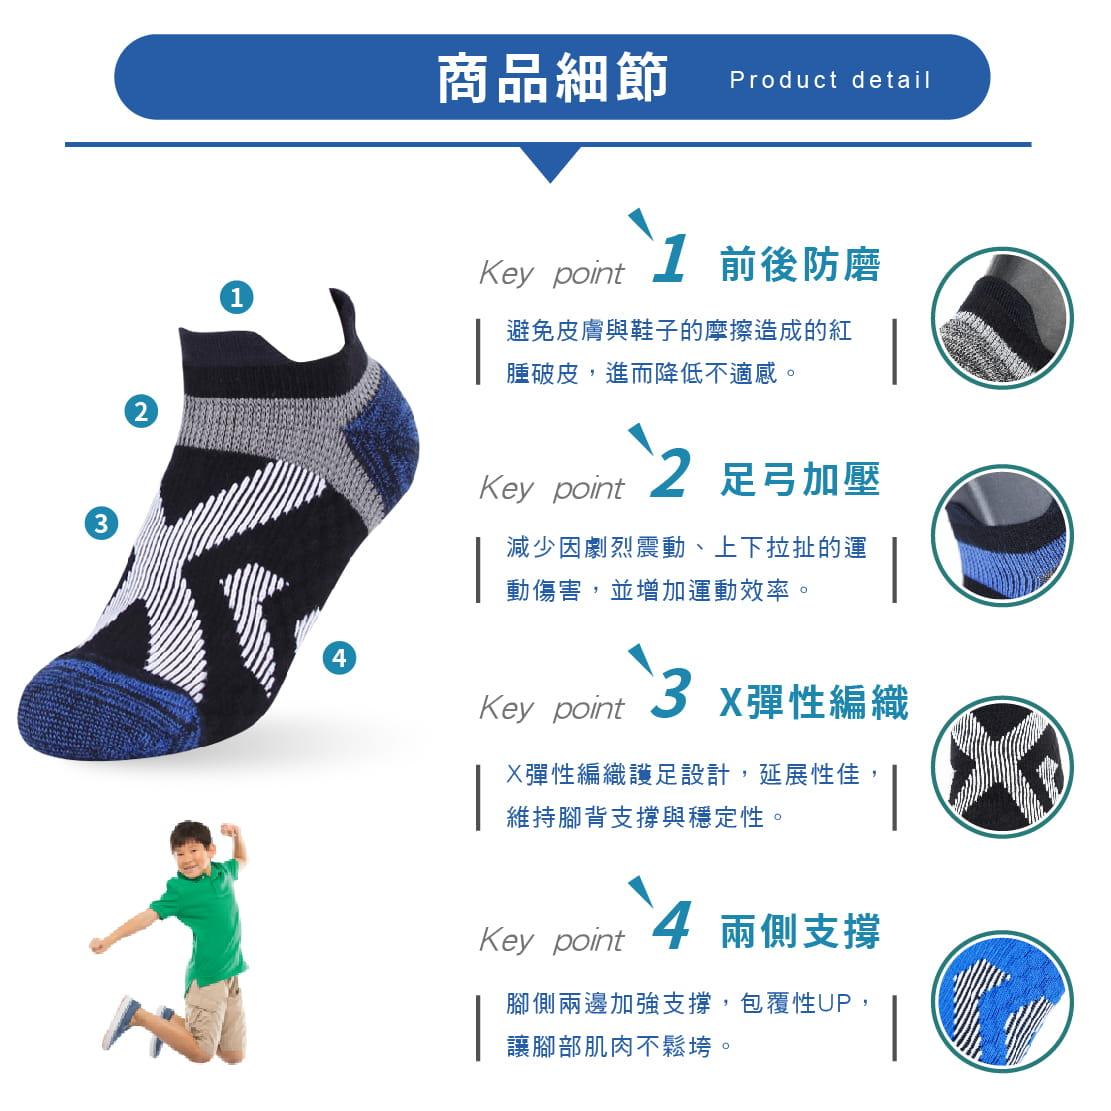 【FAV】足弓X型防護兒童運動襪(無止滑) 3